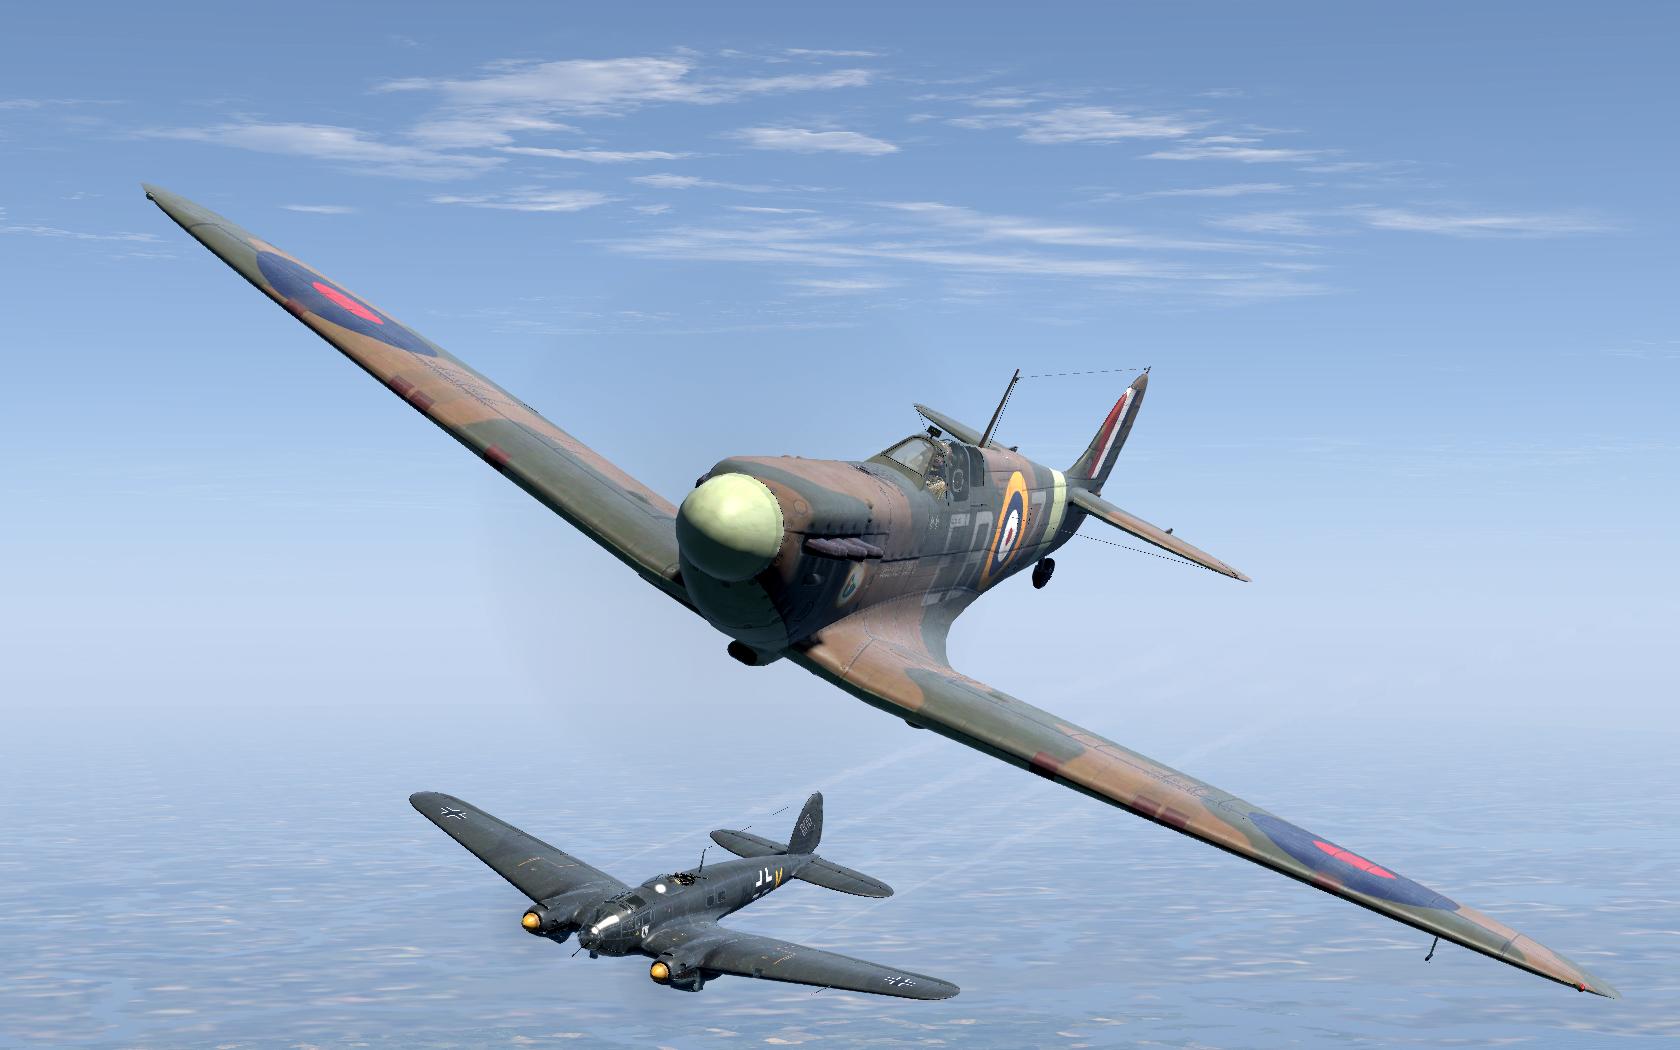 COD KF MkIIa RAF 41Sqn EBZ Jack Stokoe P7666 England 1941 V05